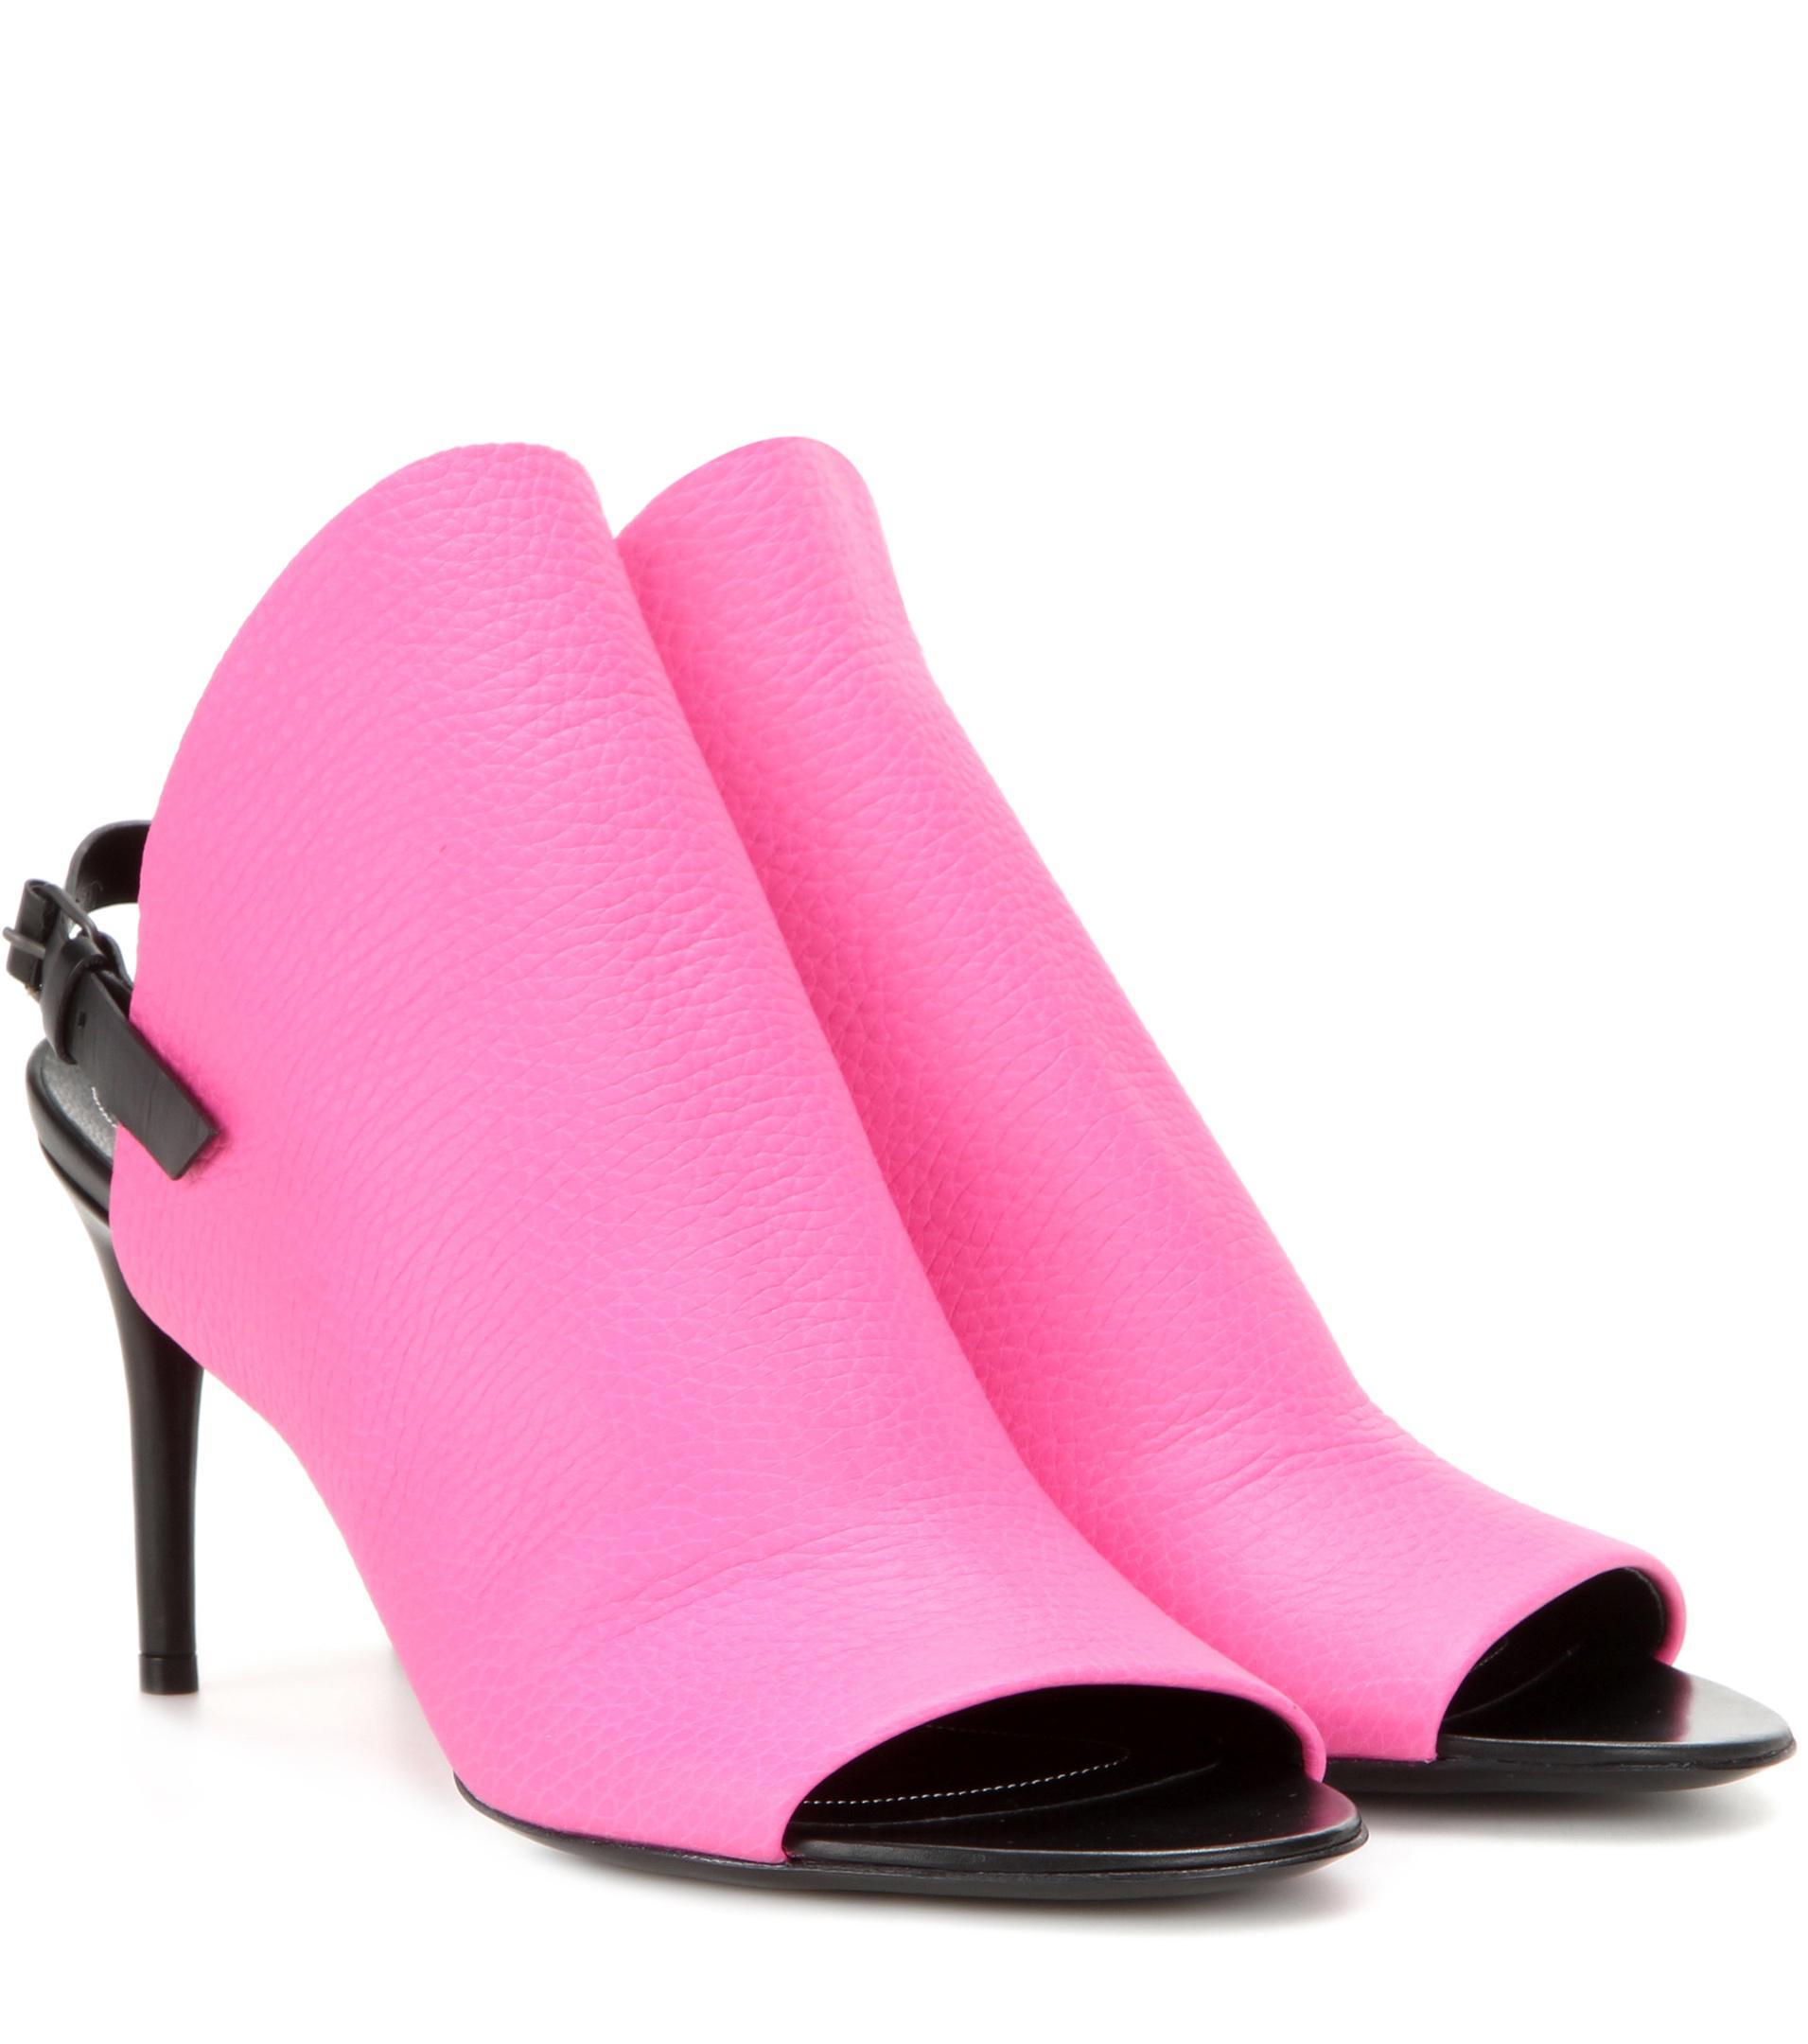 Balenciaga Clew leather sandals VIXlEu1TAW